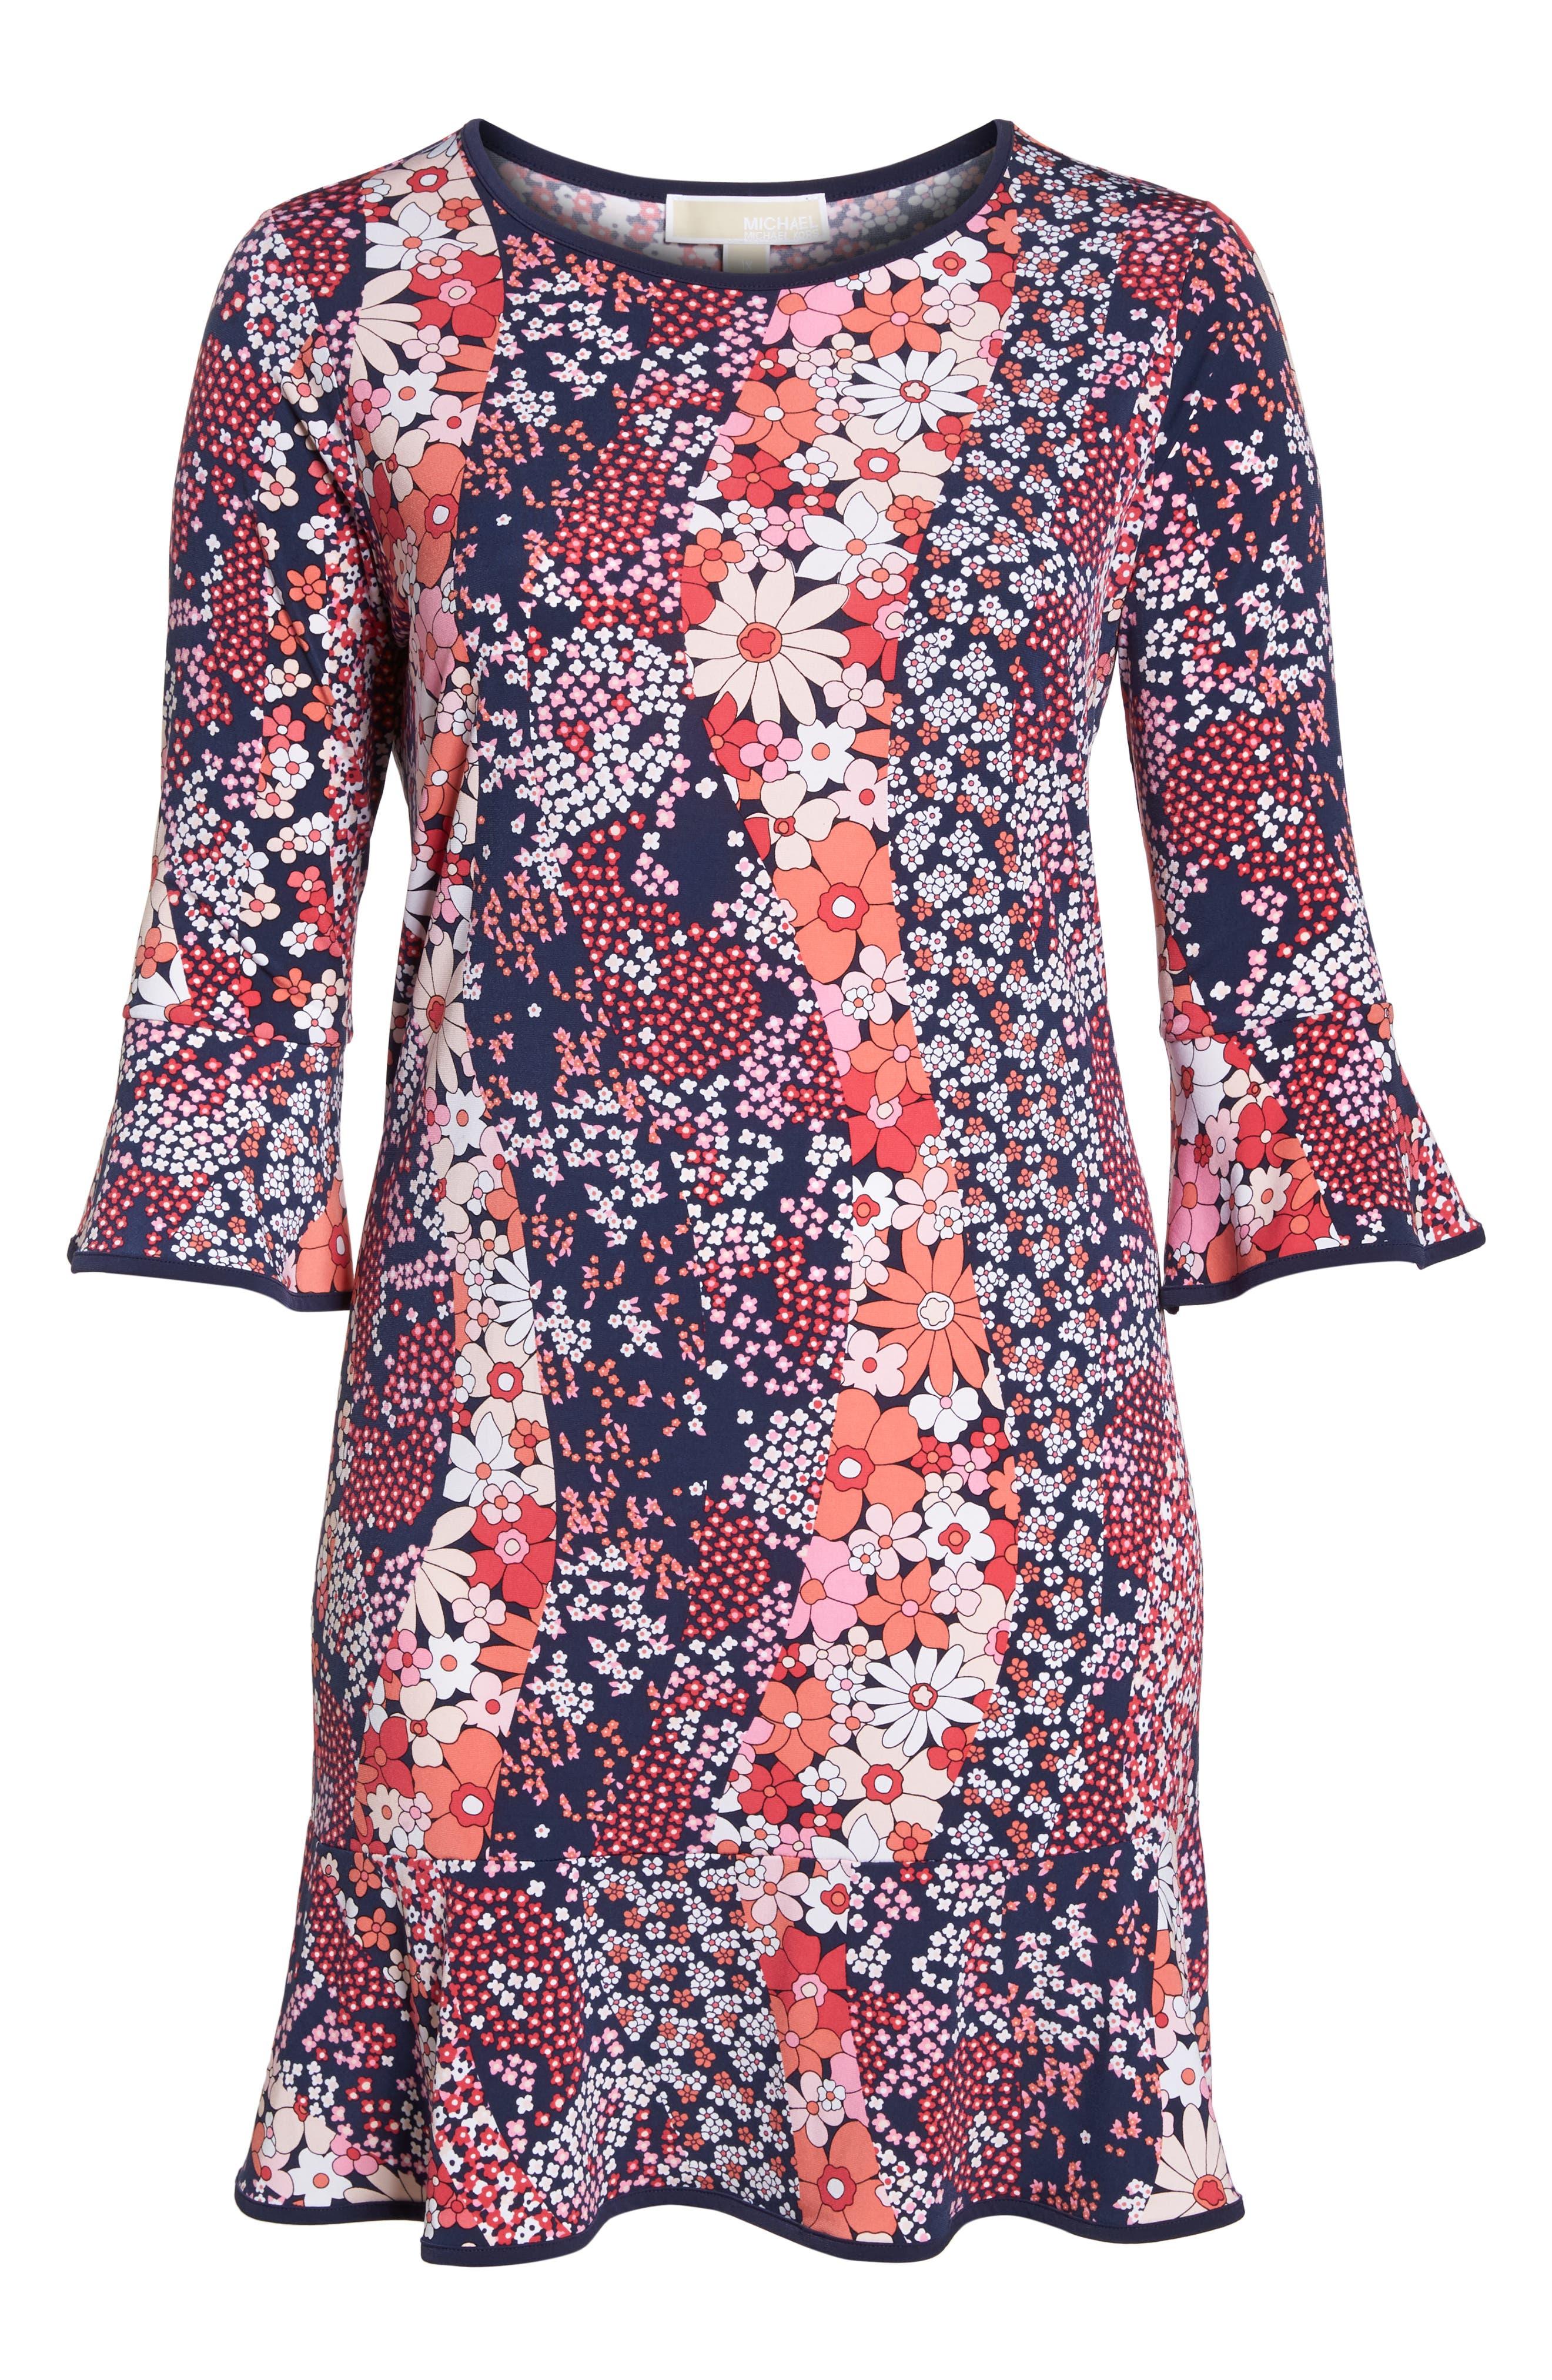 MICHAEL MICHAEL KORS,                             Patchwork Floral Bell Sleeve Shift Dress,                             Alternate thumbnail 7, color,                             679